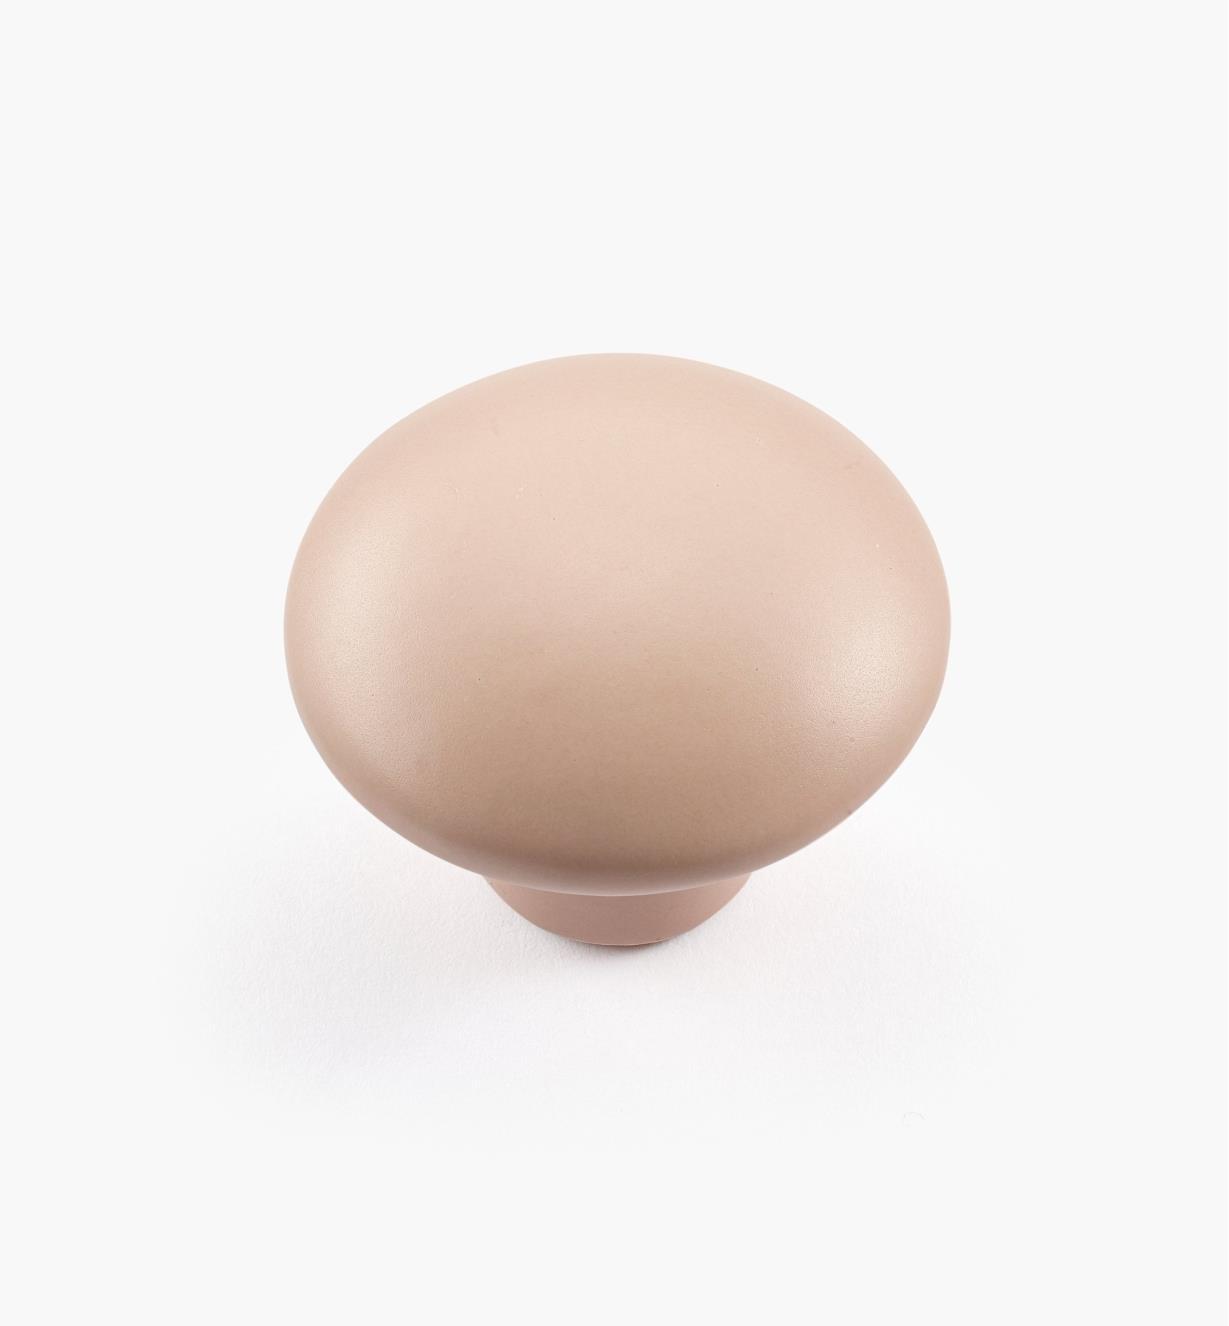 00W5281 - Matte Pink Knob